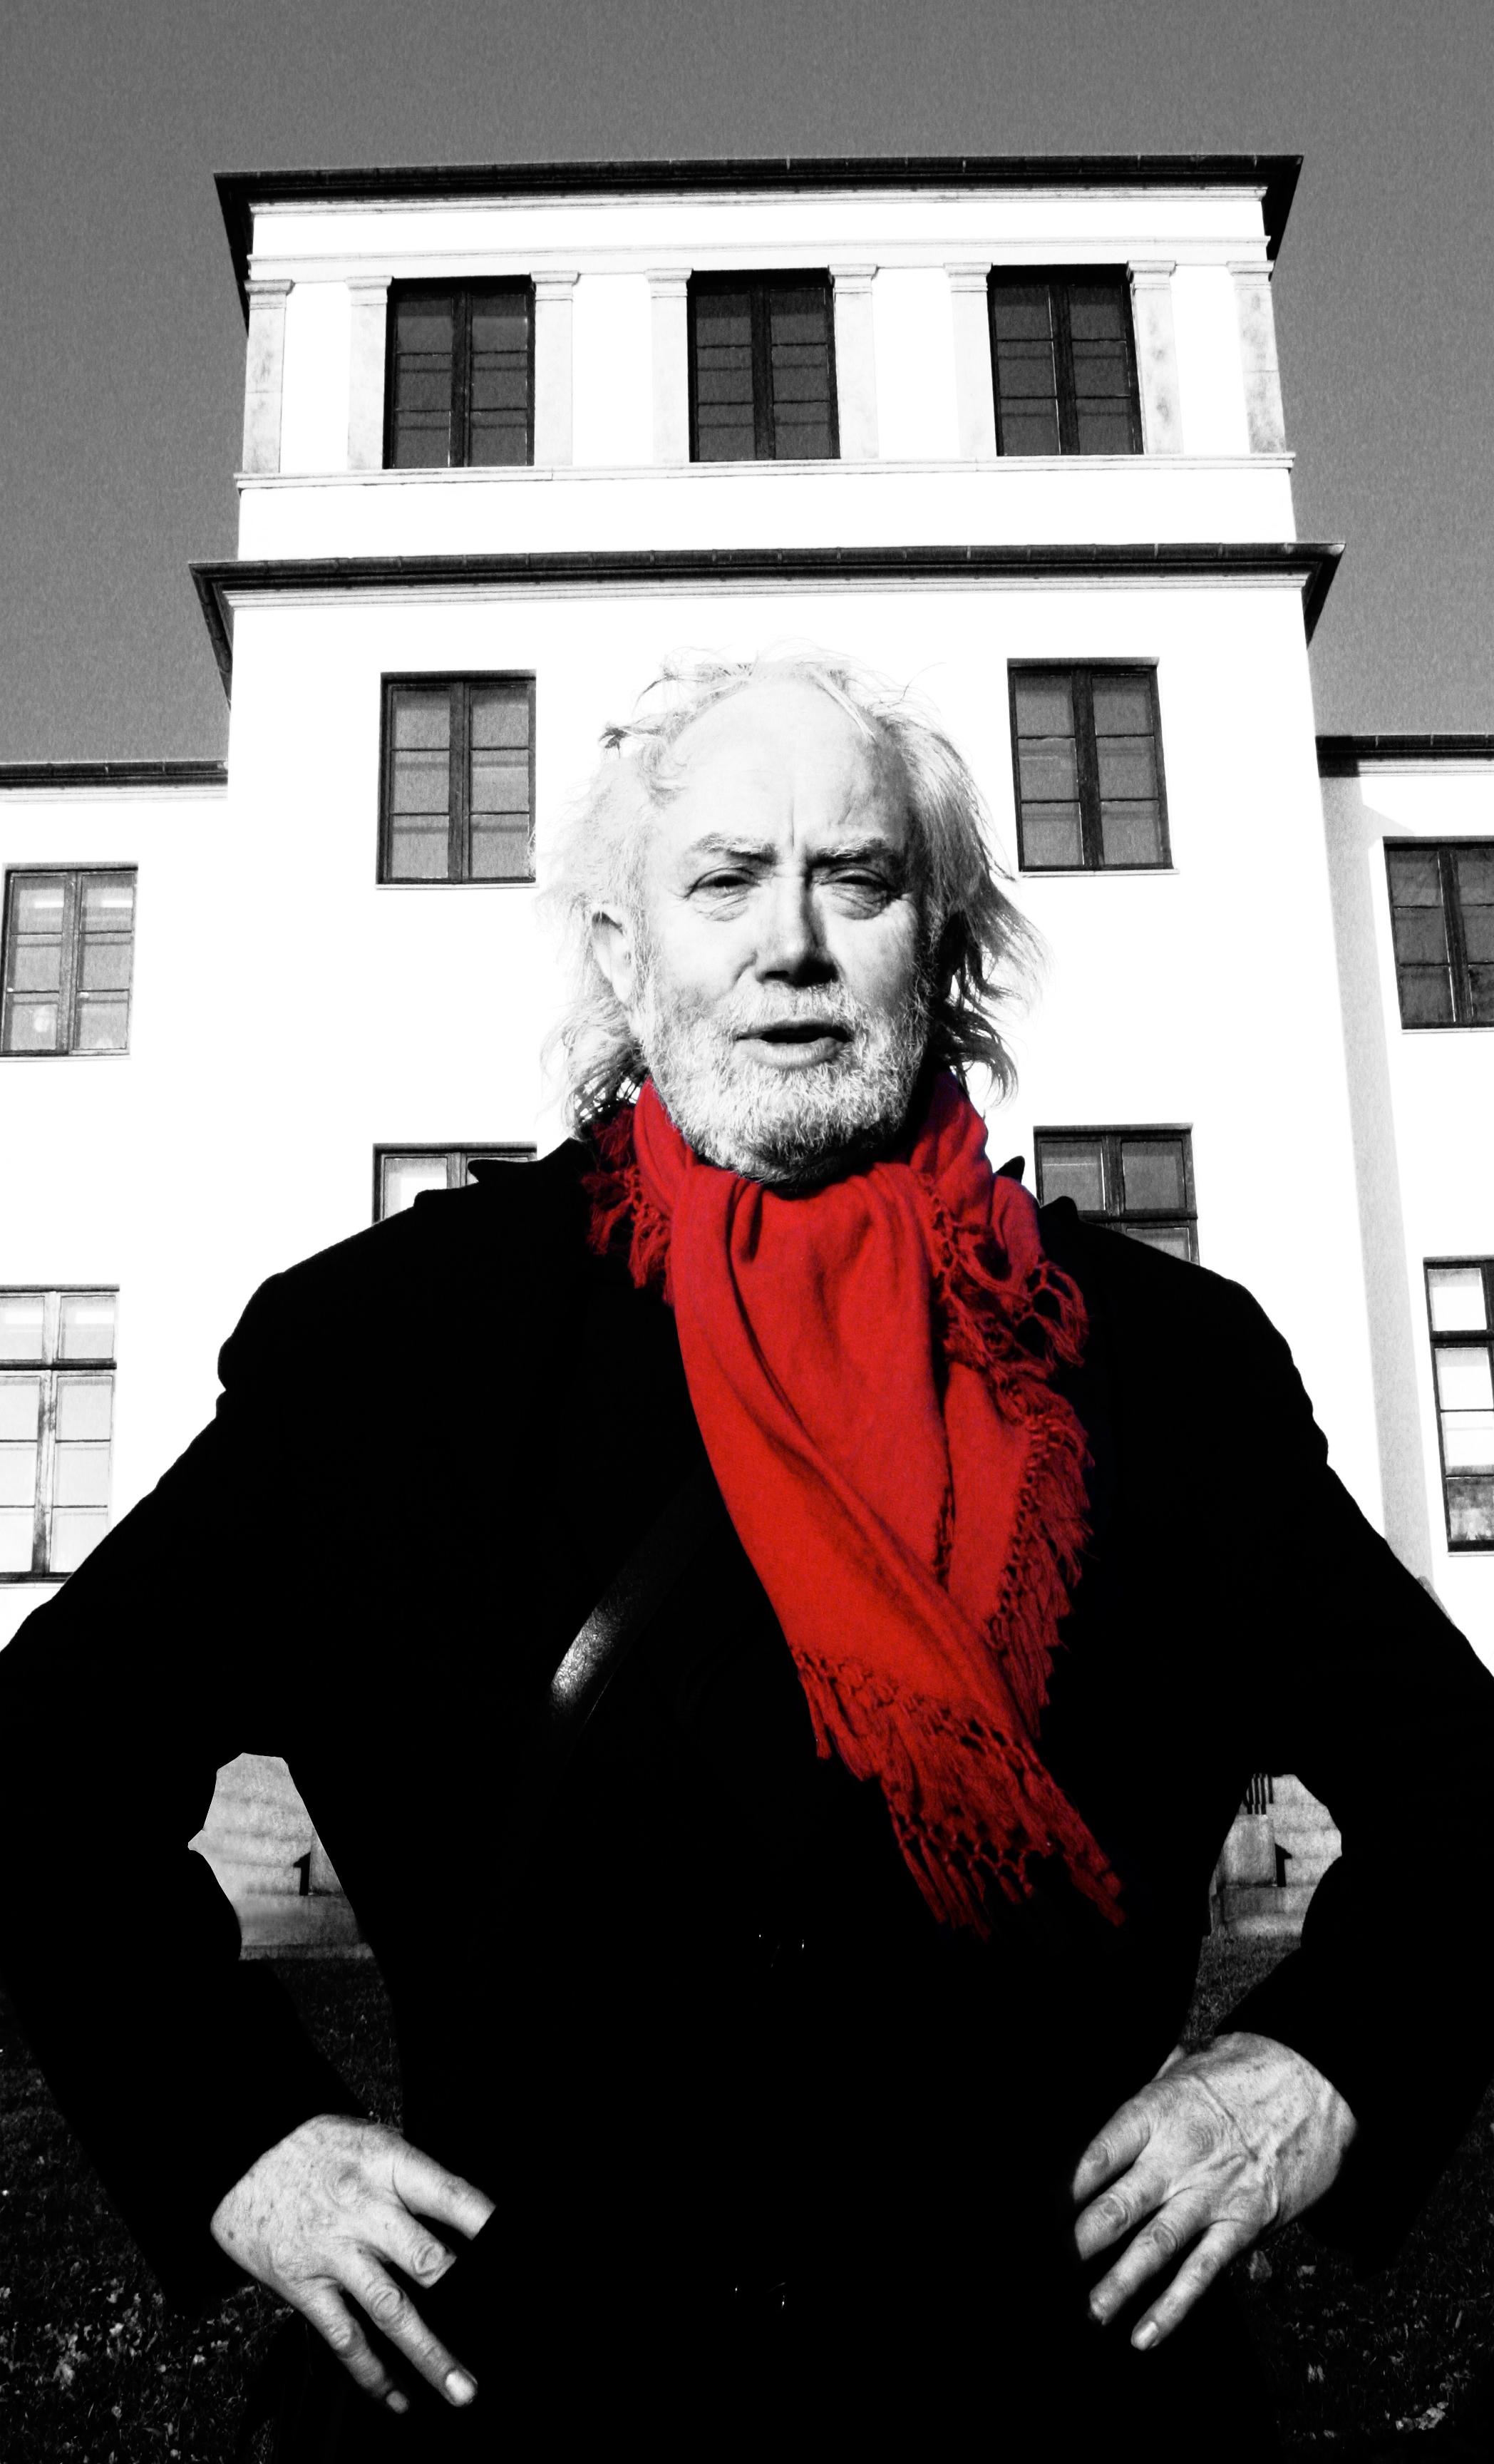 Foto: Paal Bråtelund